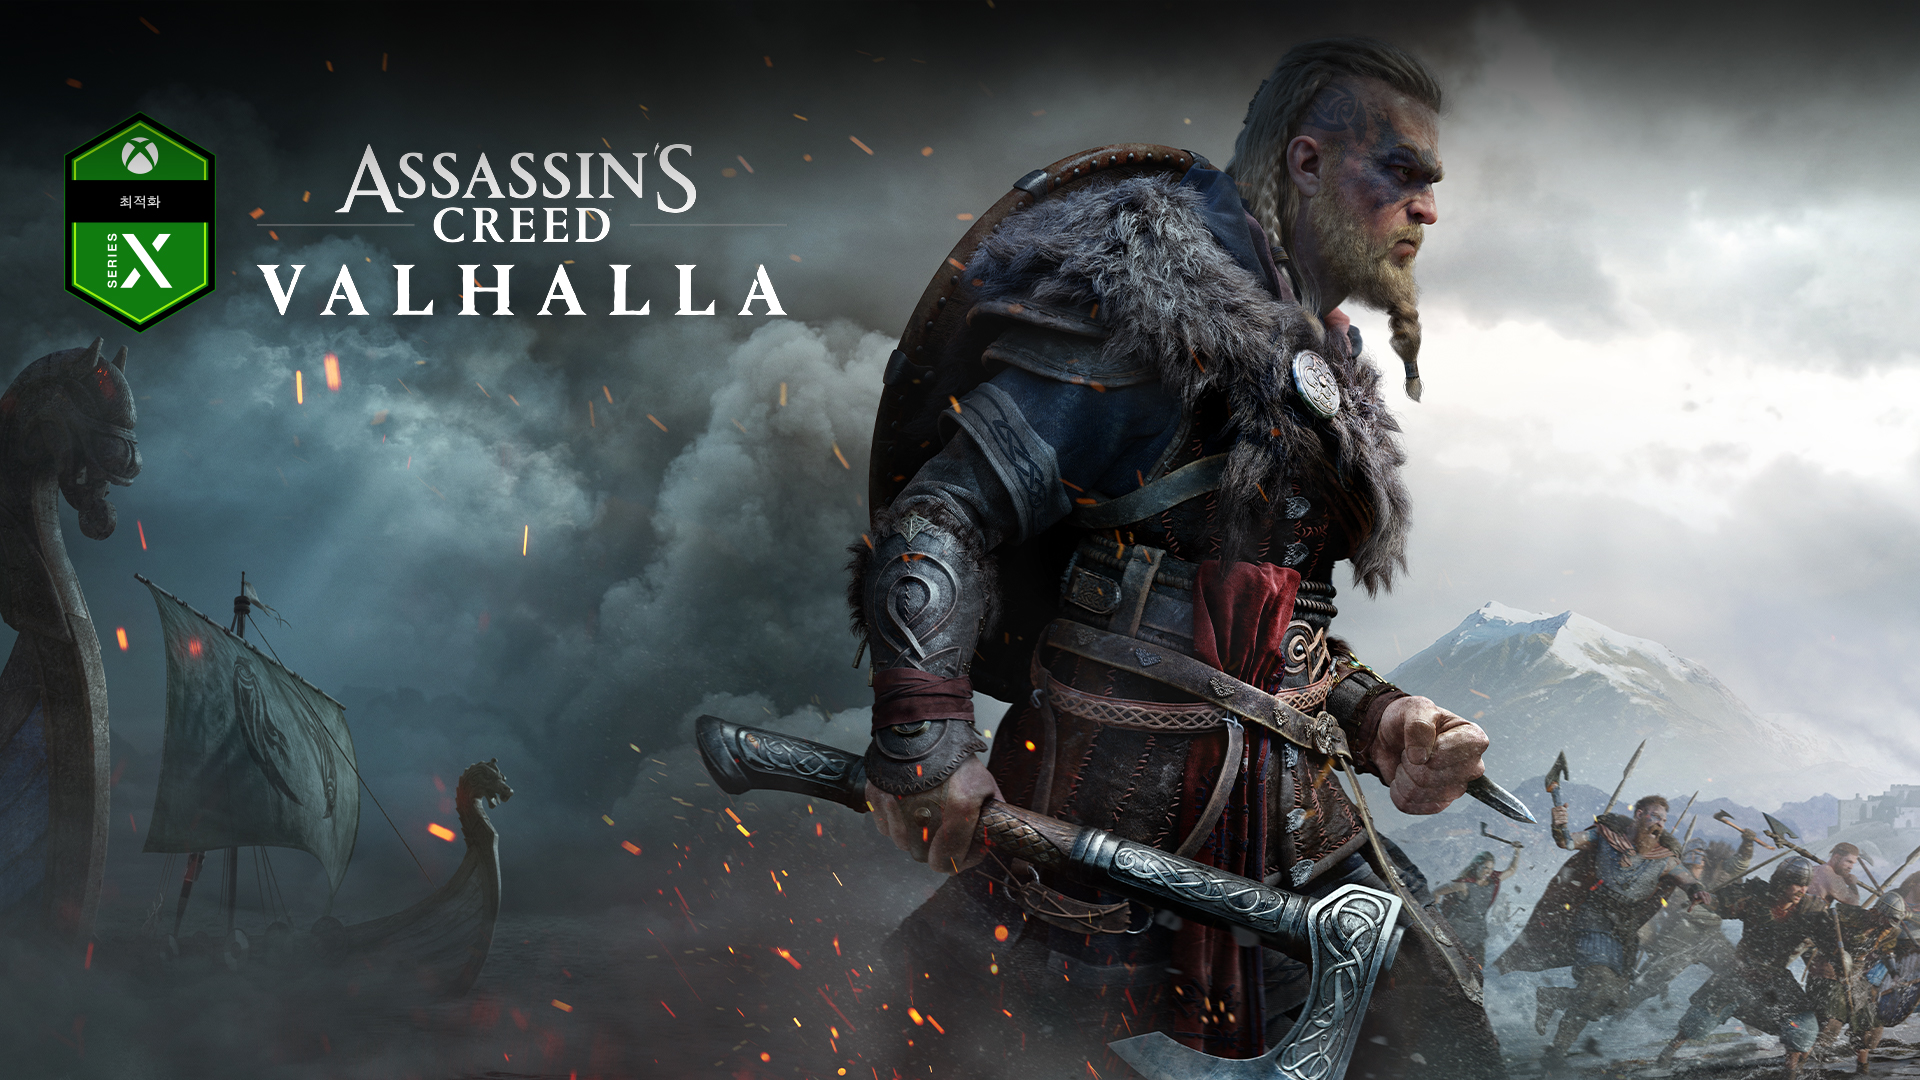 Xbox Series X 로고에 최적화, 어쌔신 크리드 발할라, 도끼를 들고 있는 캐릭터, 안개 속의 함선과 전투